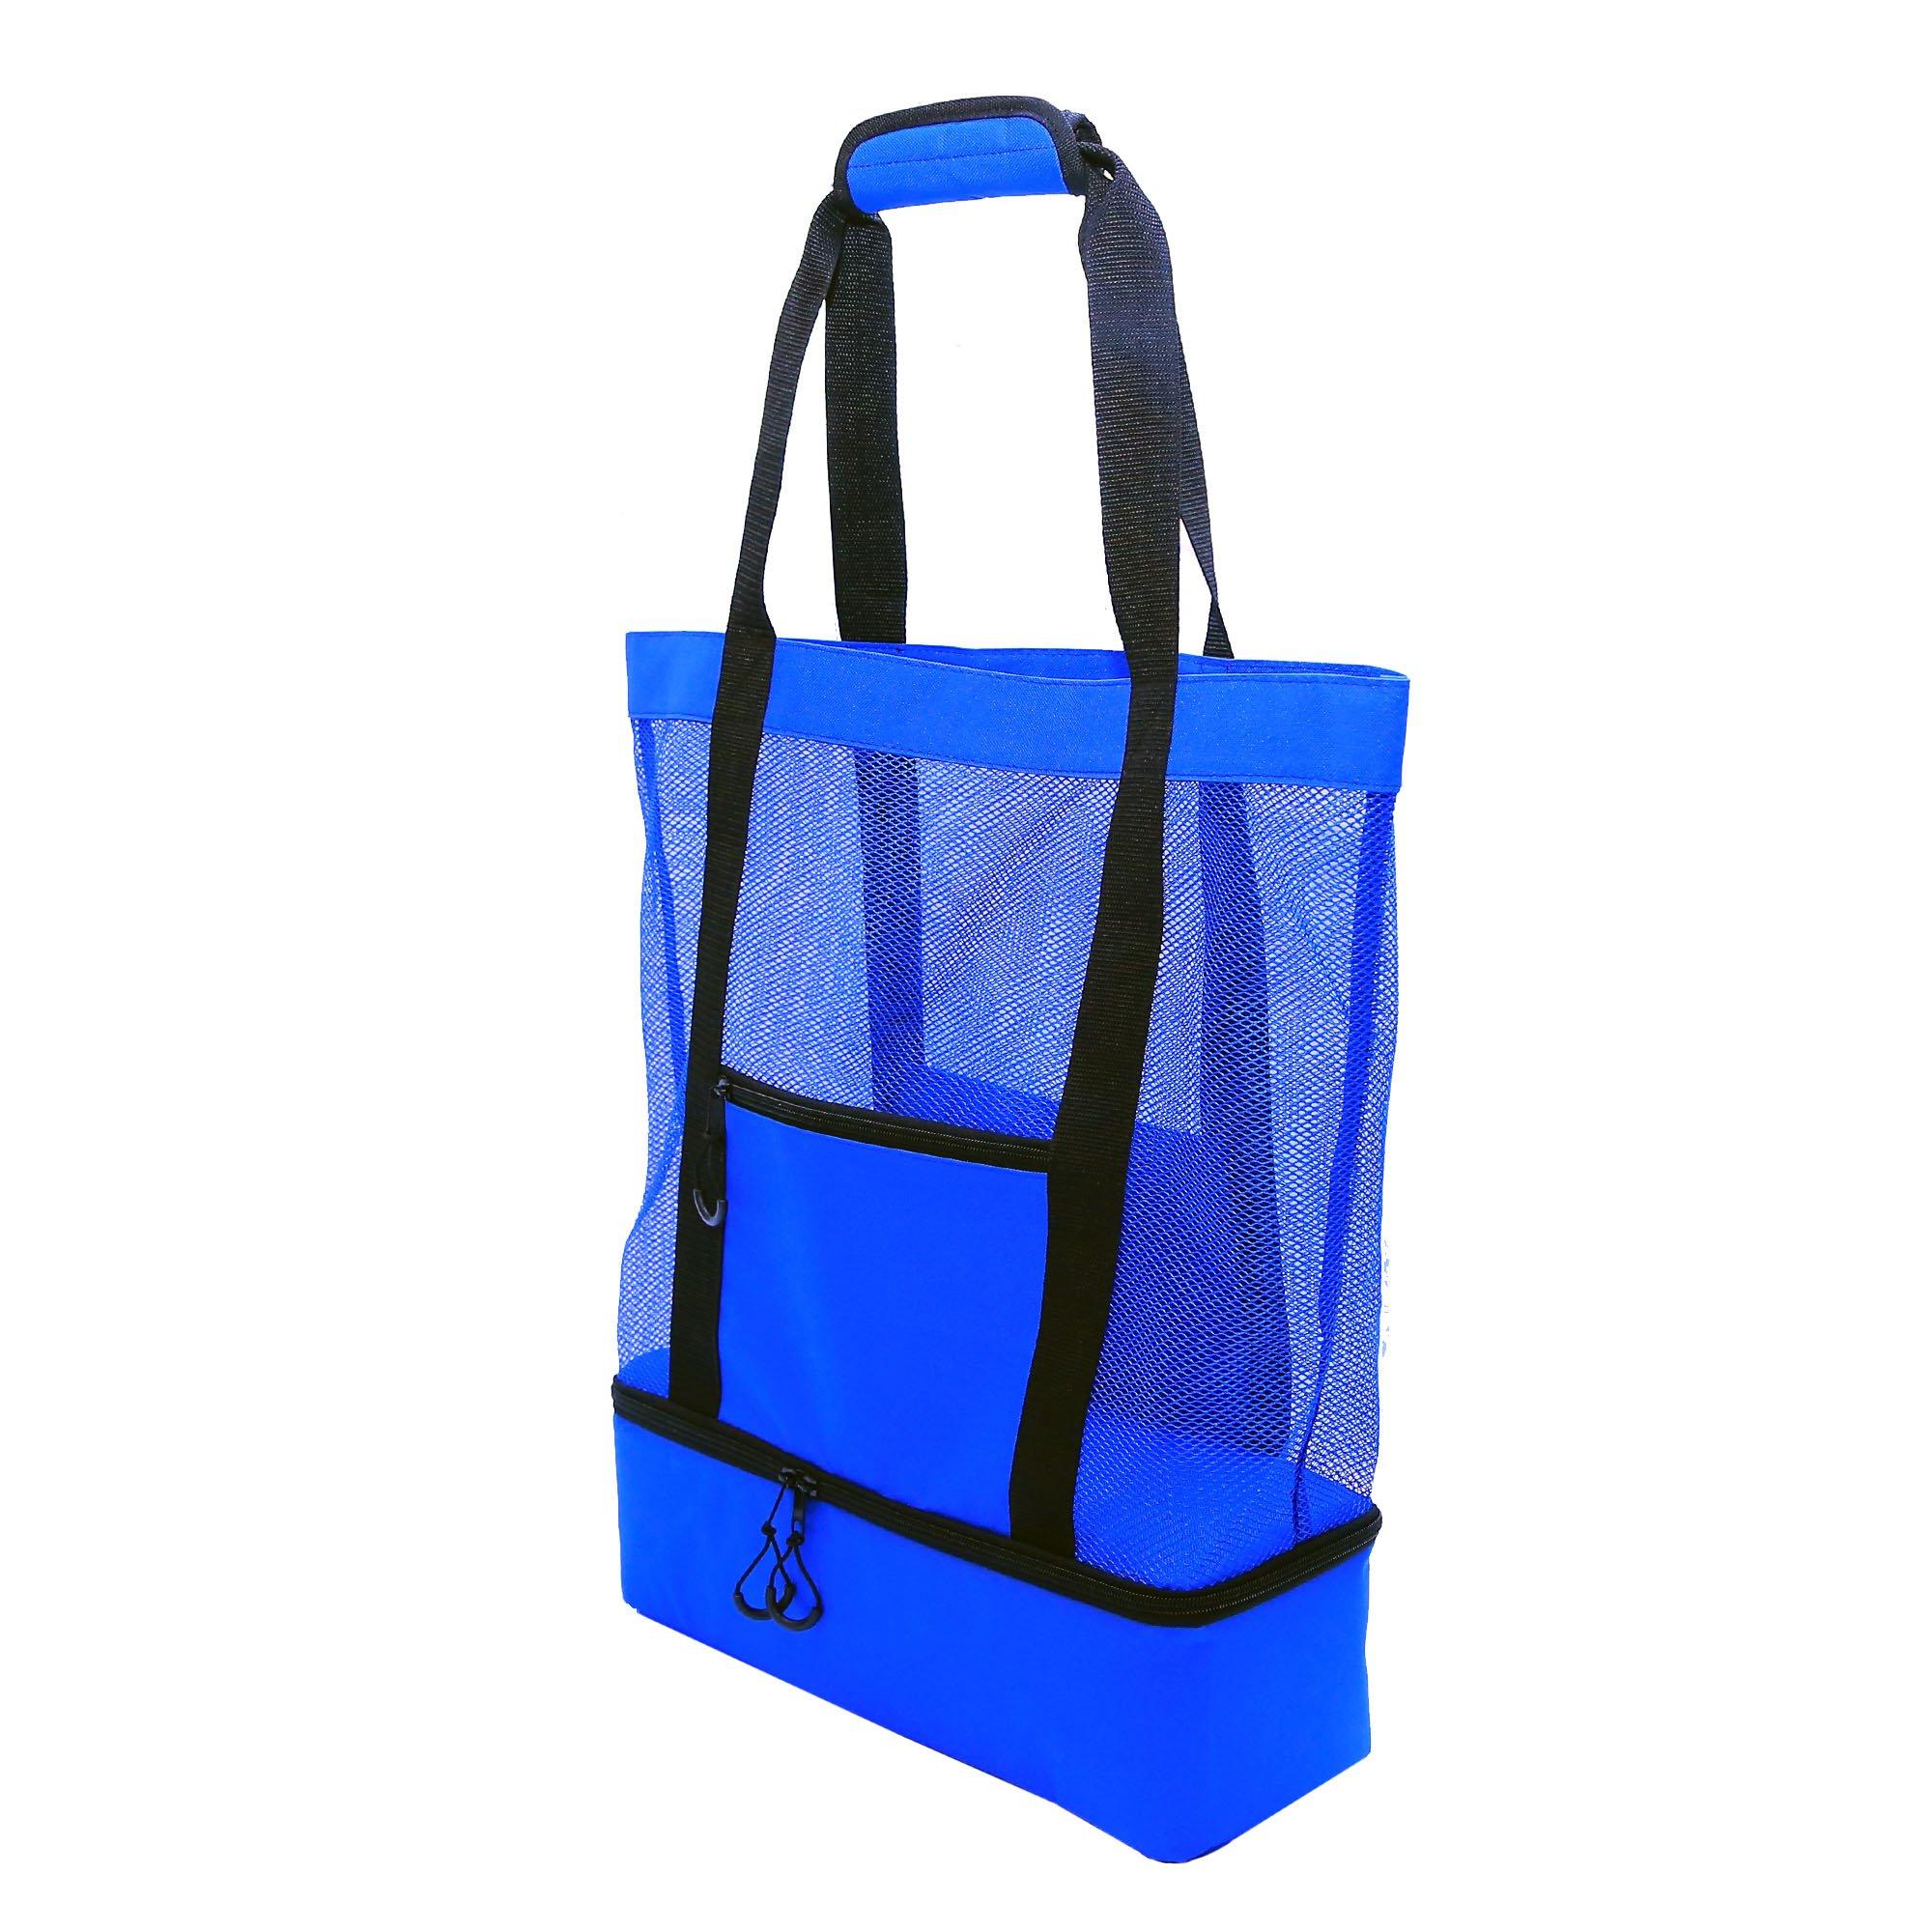 JU&JI's Beach Tote Bags – 2-in-1 Design – Mesh Bag & Built-in Picnic Cooler Compartment – Big or Extra Large Cooler Beach Bags – Padded Handle, Waterproof Zipper & Heavy-Duty Build by Ju&Ji (Image #5)